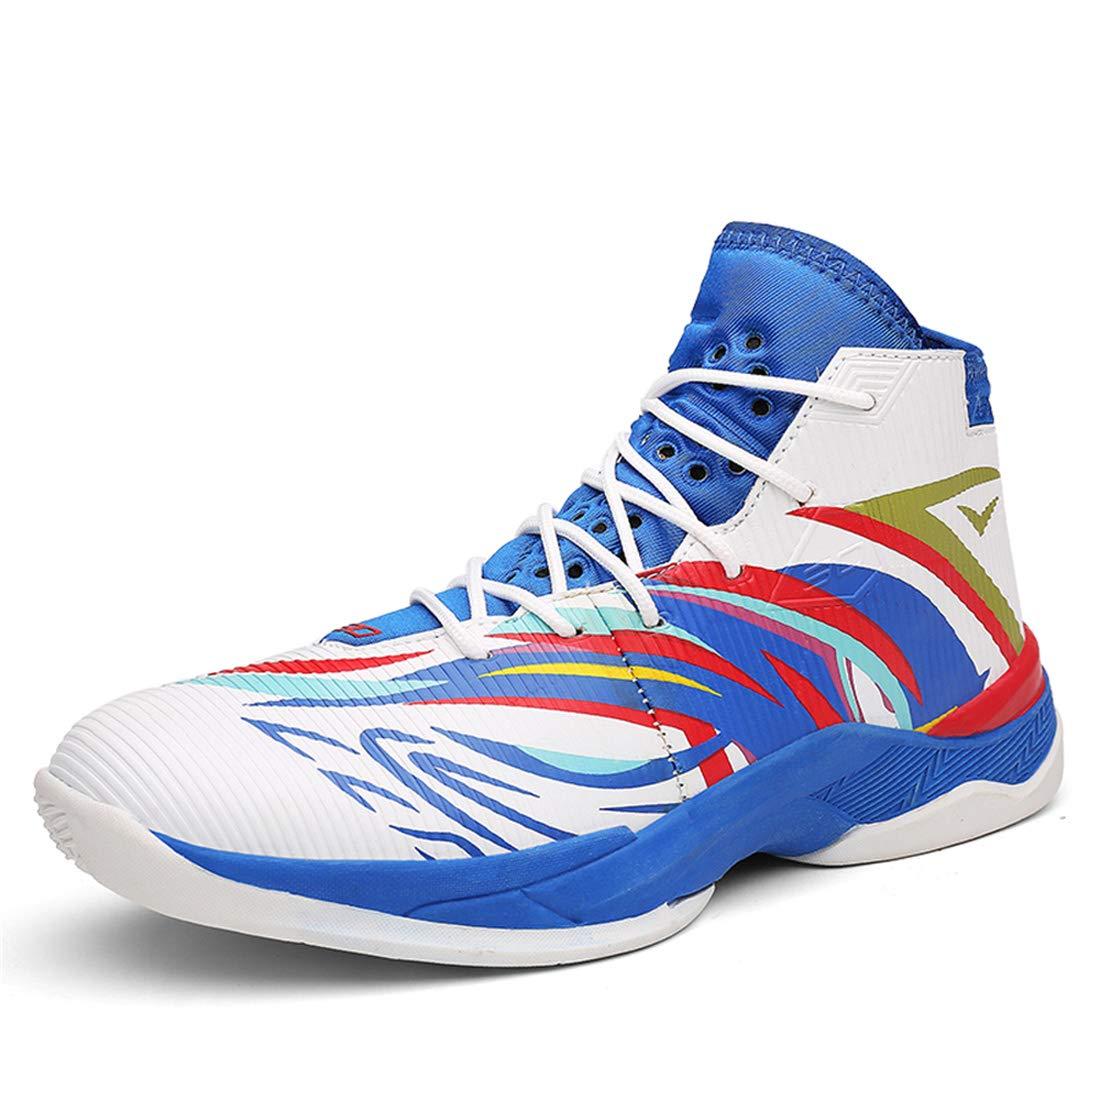 Chaussures Ball Dandanjie Hommes De Basket IYbfgv6y7